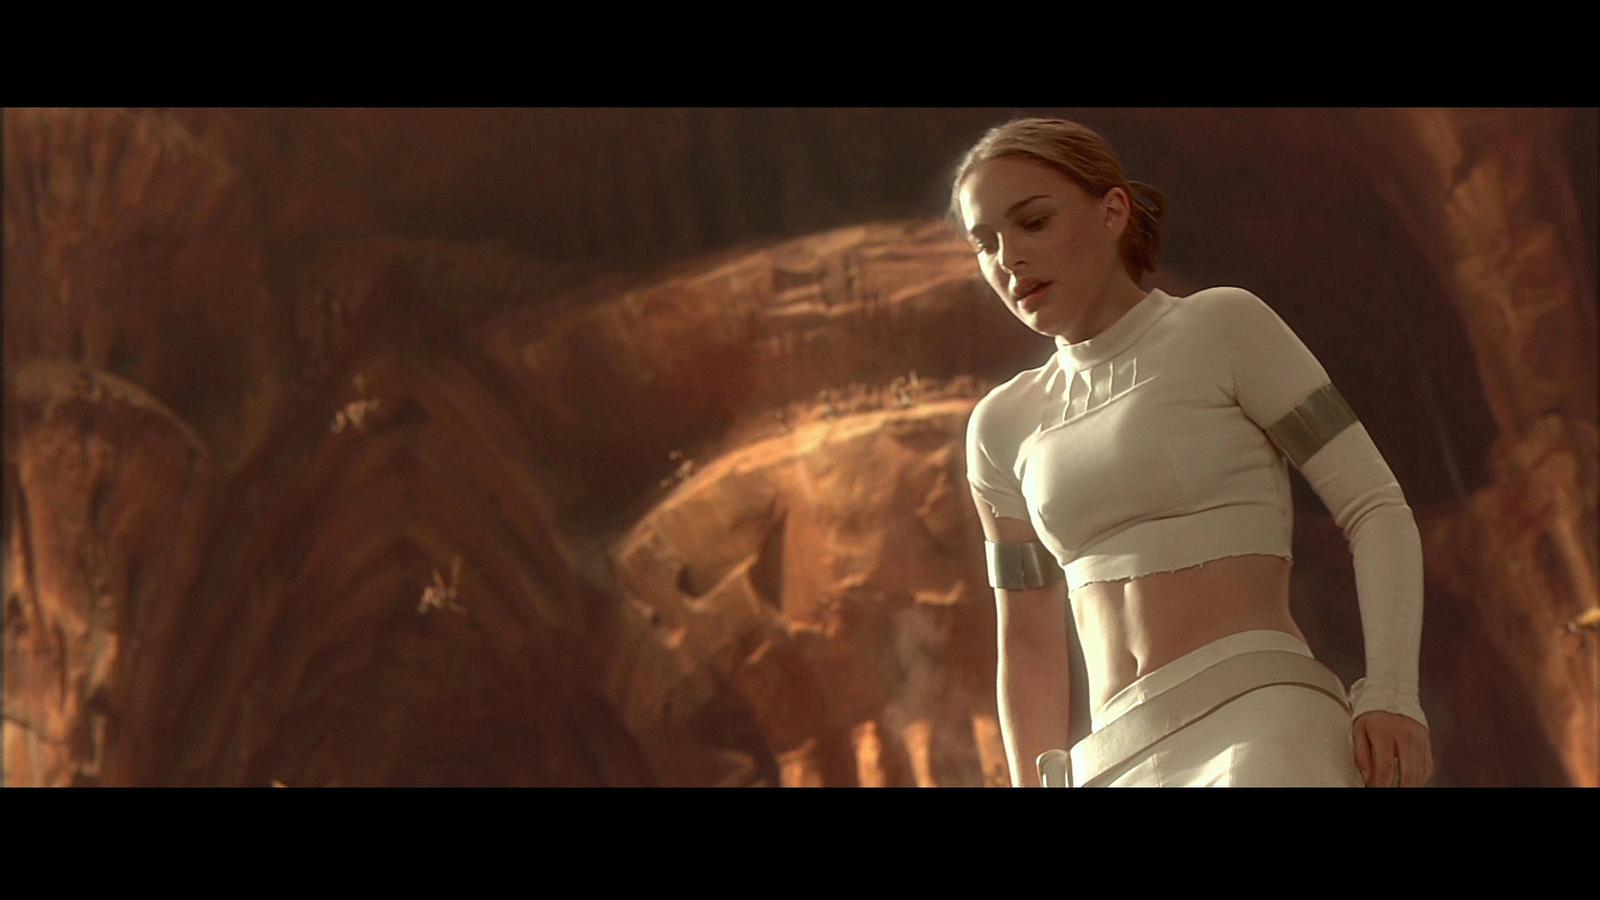 Star Wars Episode Ii Padme Amidala 19 By Newyunggun On